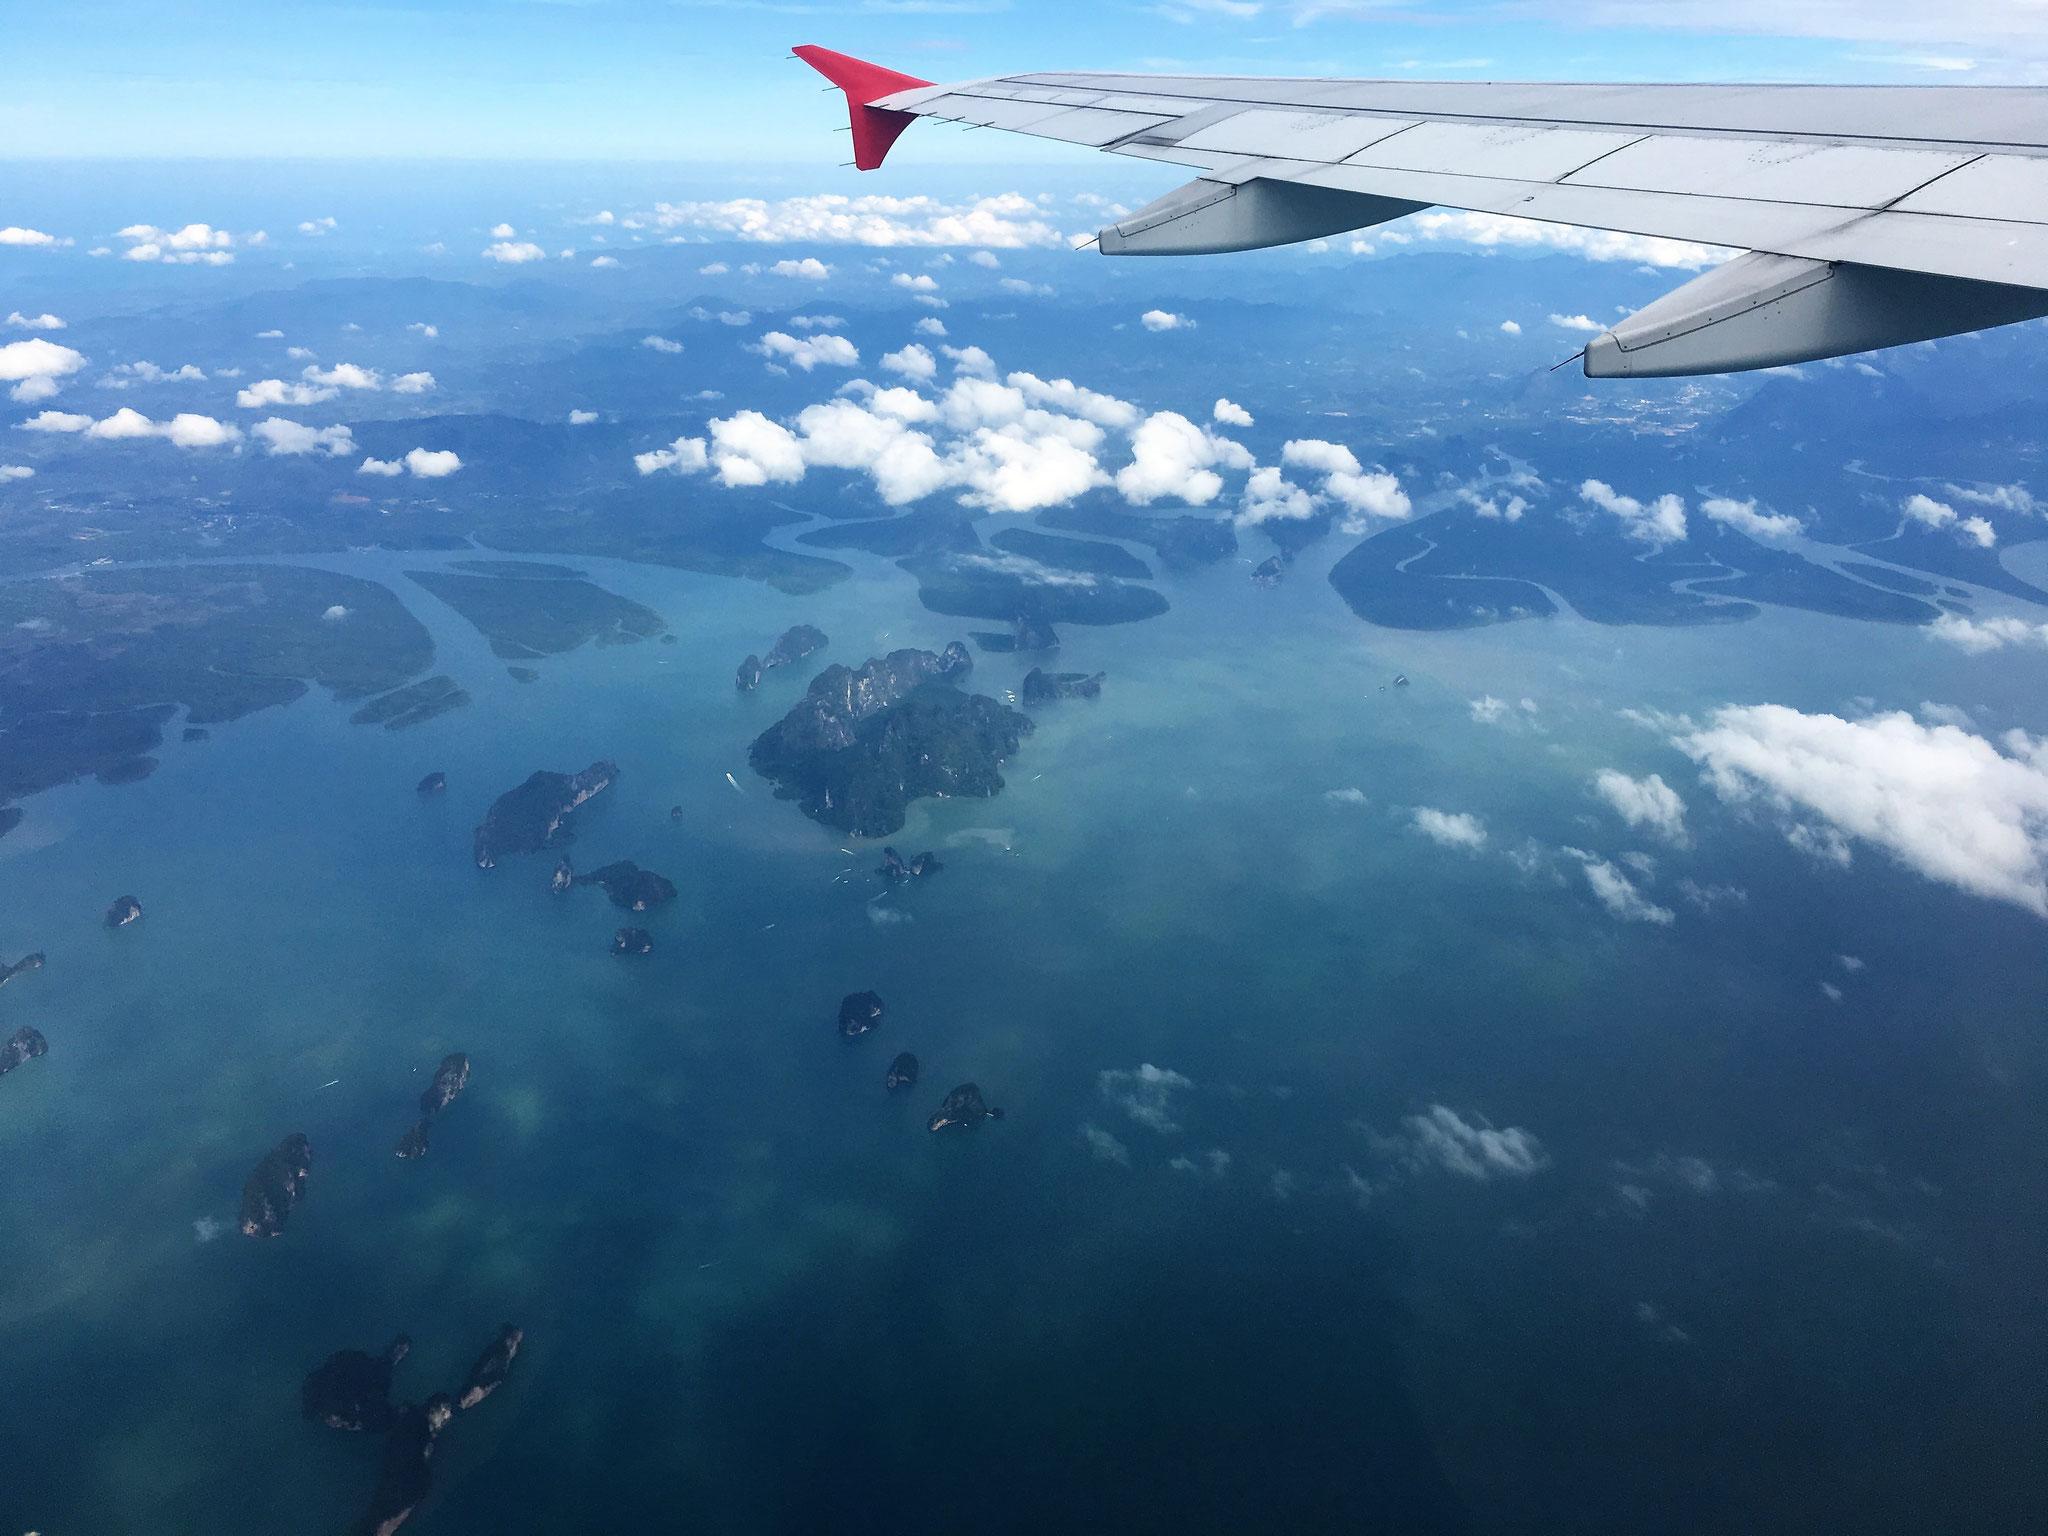 Phang Nga Bucht von oben